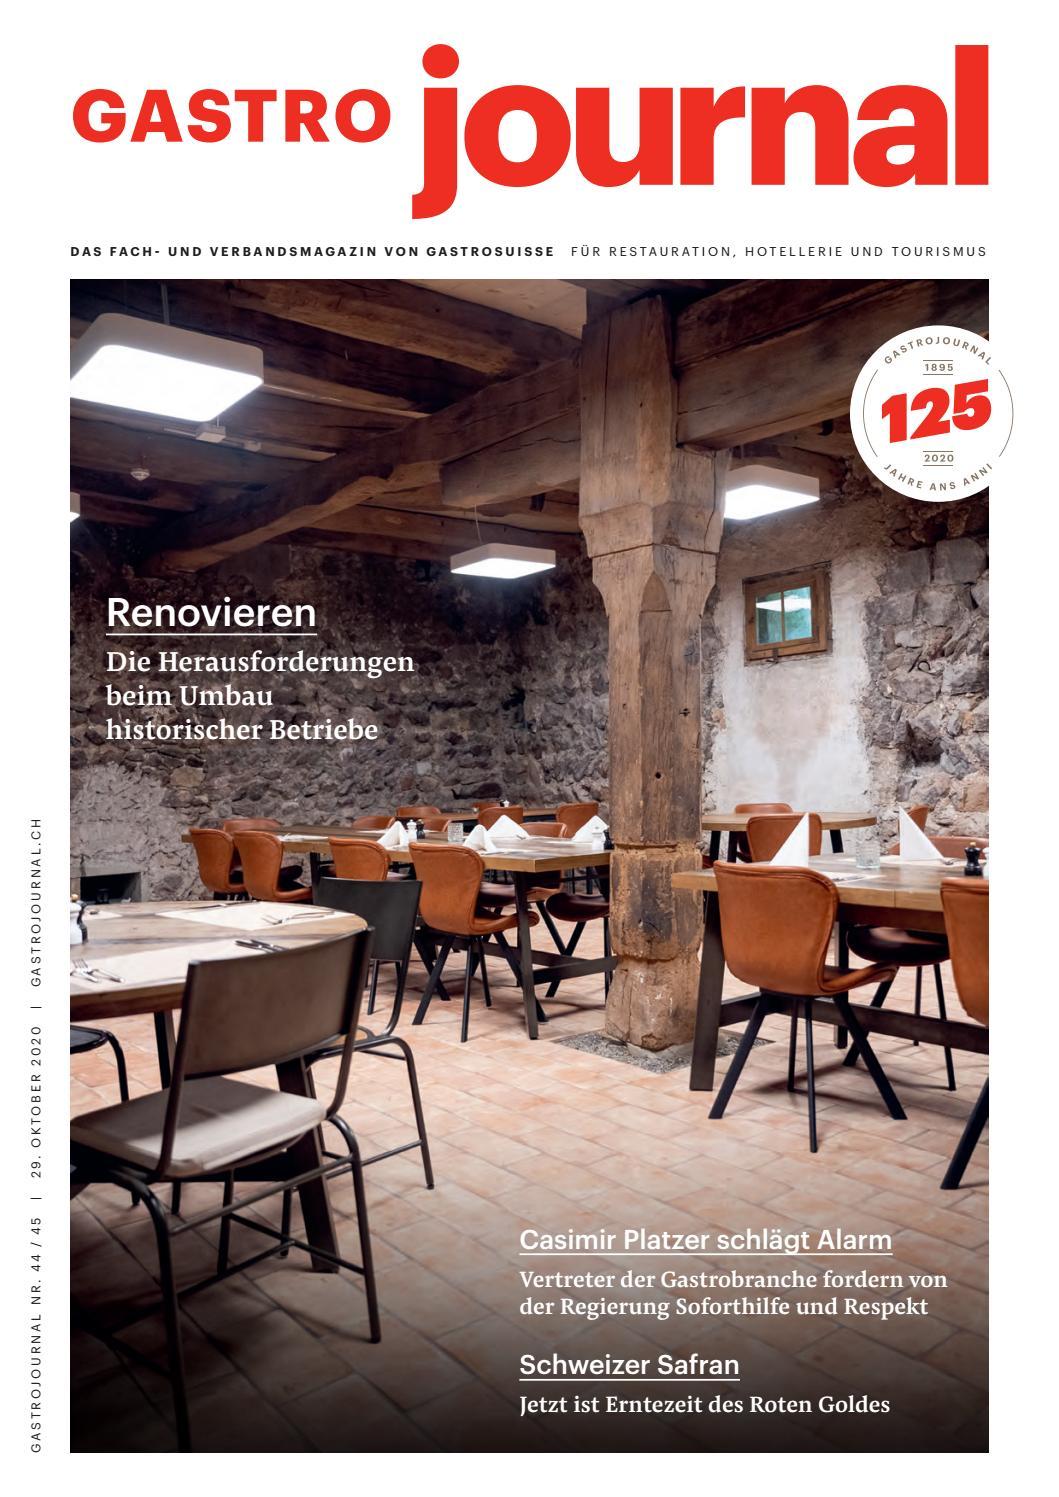 Gastrojournal 44 45 2020 By Gastrojournal Issuu